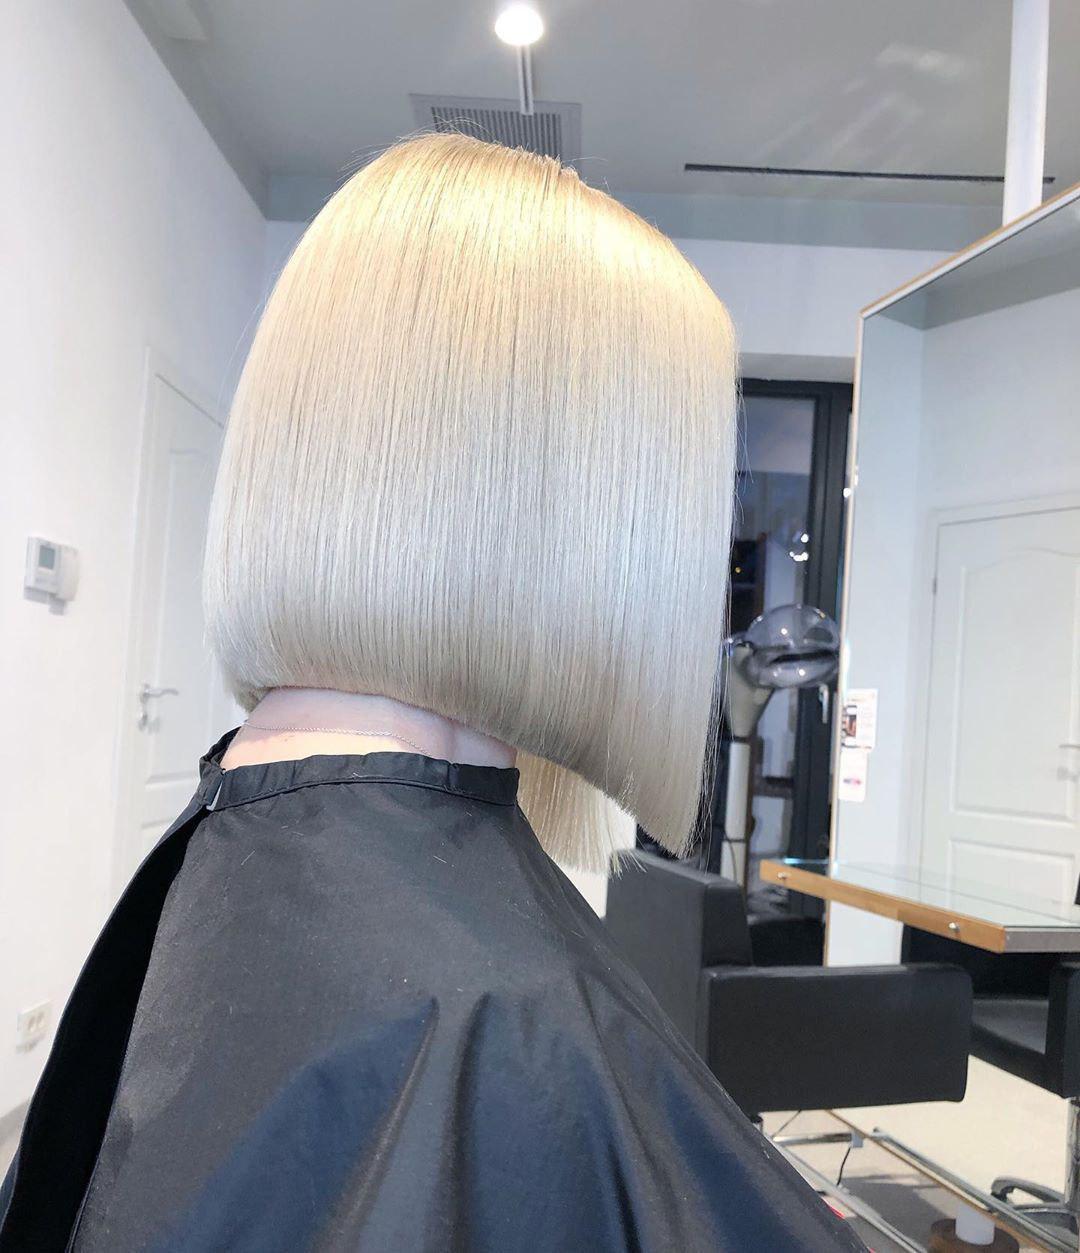 کوتاهی مو مدل مصری کلاسیک ، کوتاهی مو کوتاه ، کوتاهی مو بلند ، آموزشگاه کوتاهی مو ، سالن کوتاهی مو ، مرکز کوتاهی مو ، متخصص کوتاهی مو